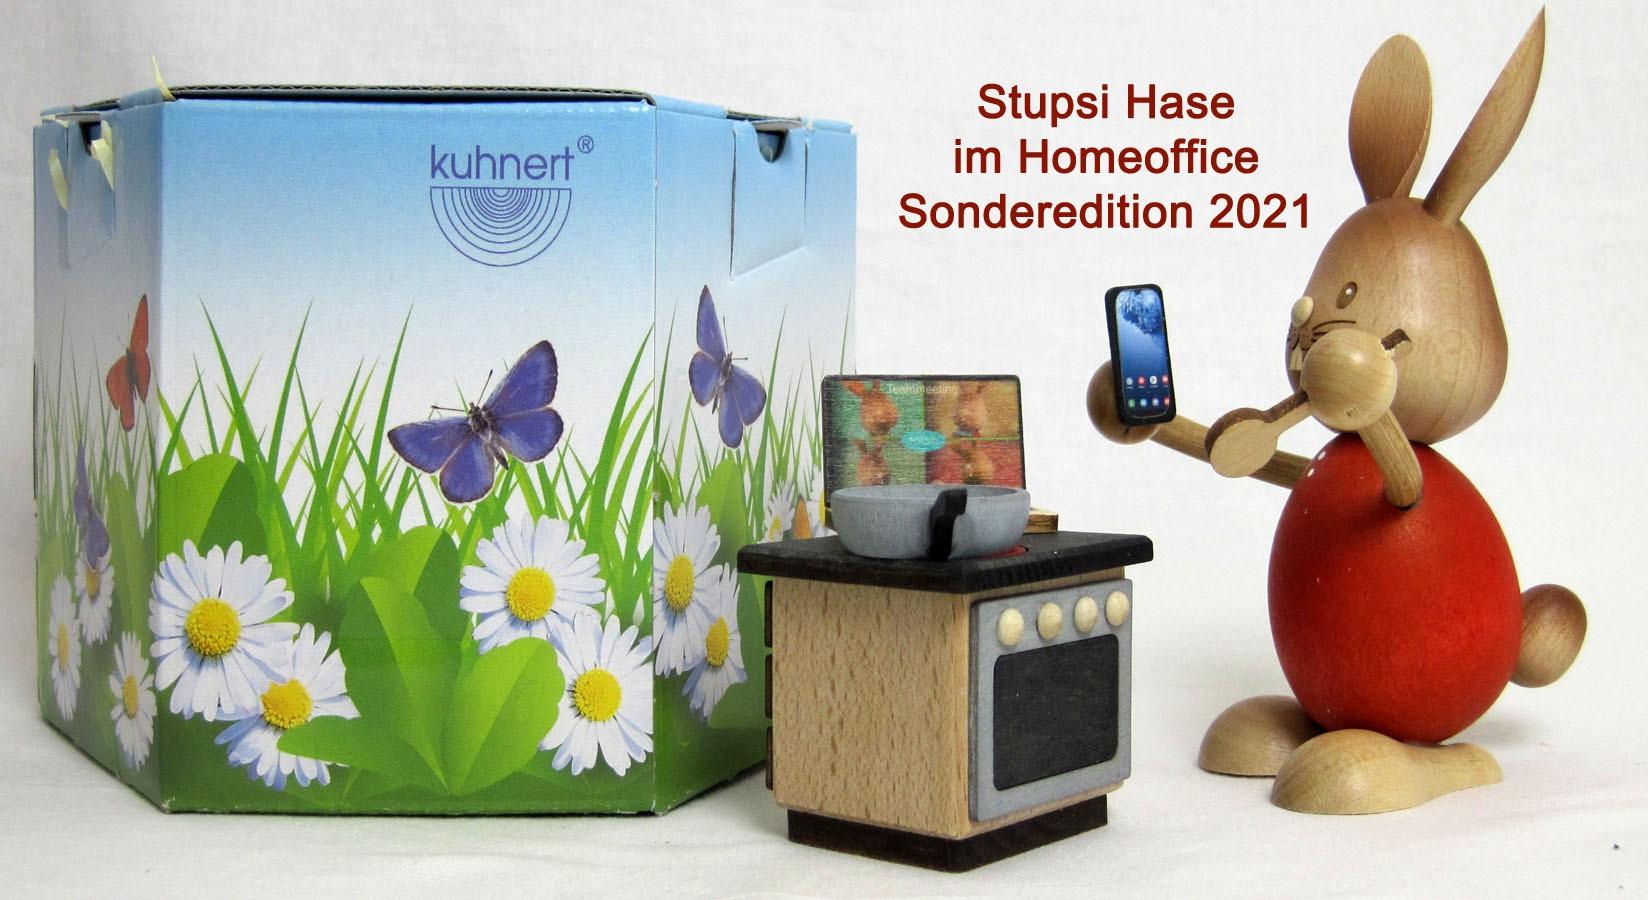 Stupsi Hase im Homeoffice - Sonderedition 2021